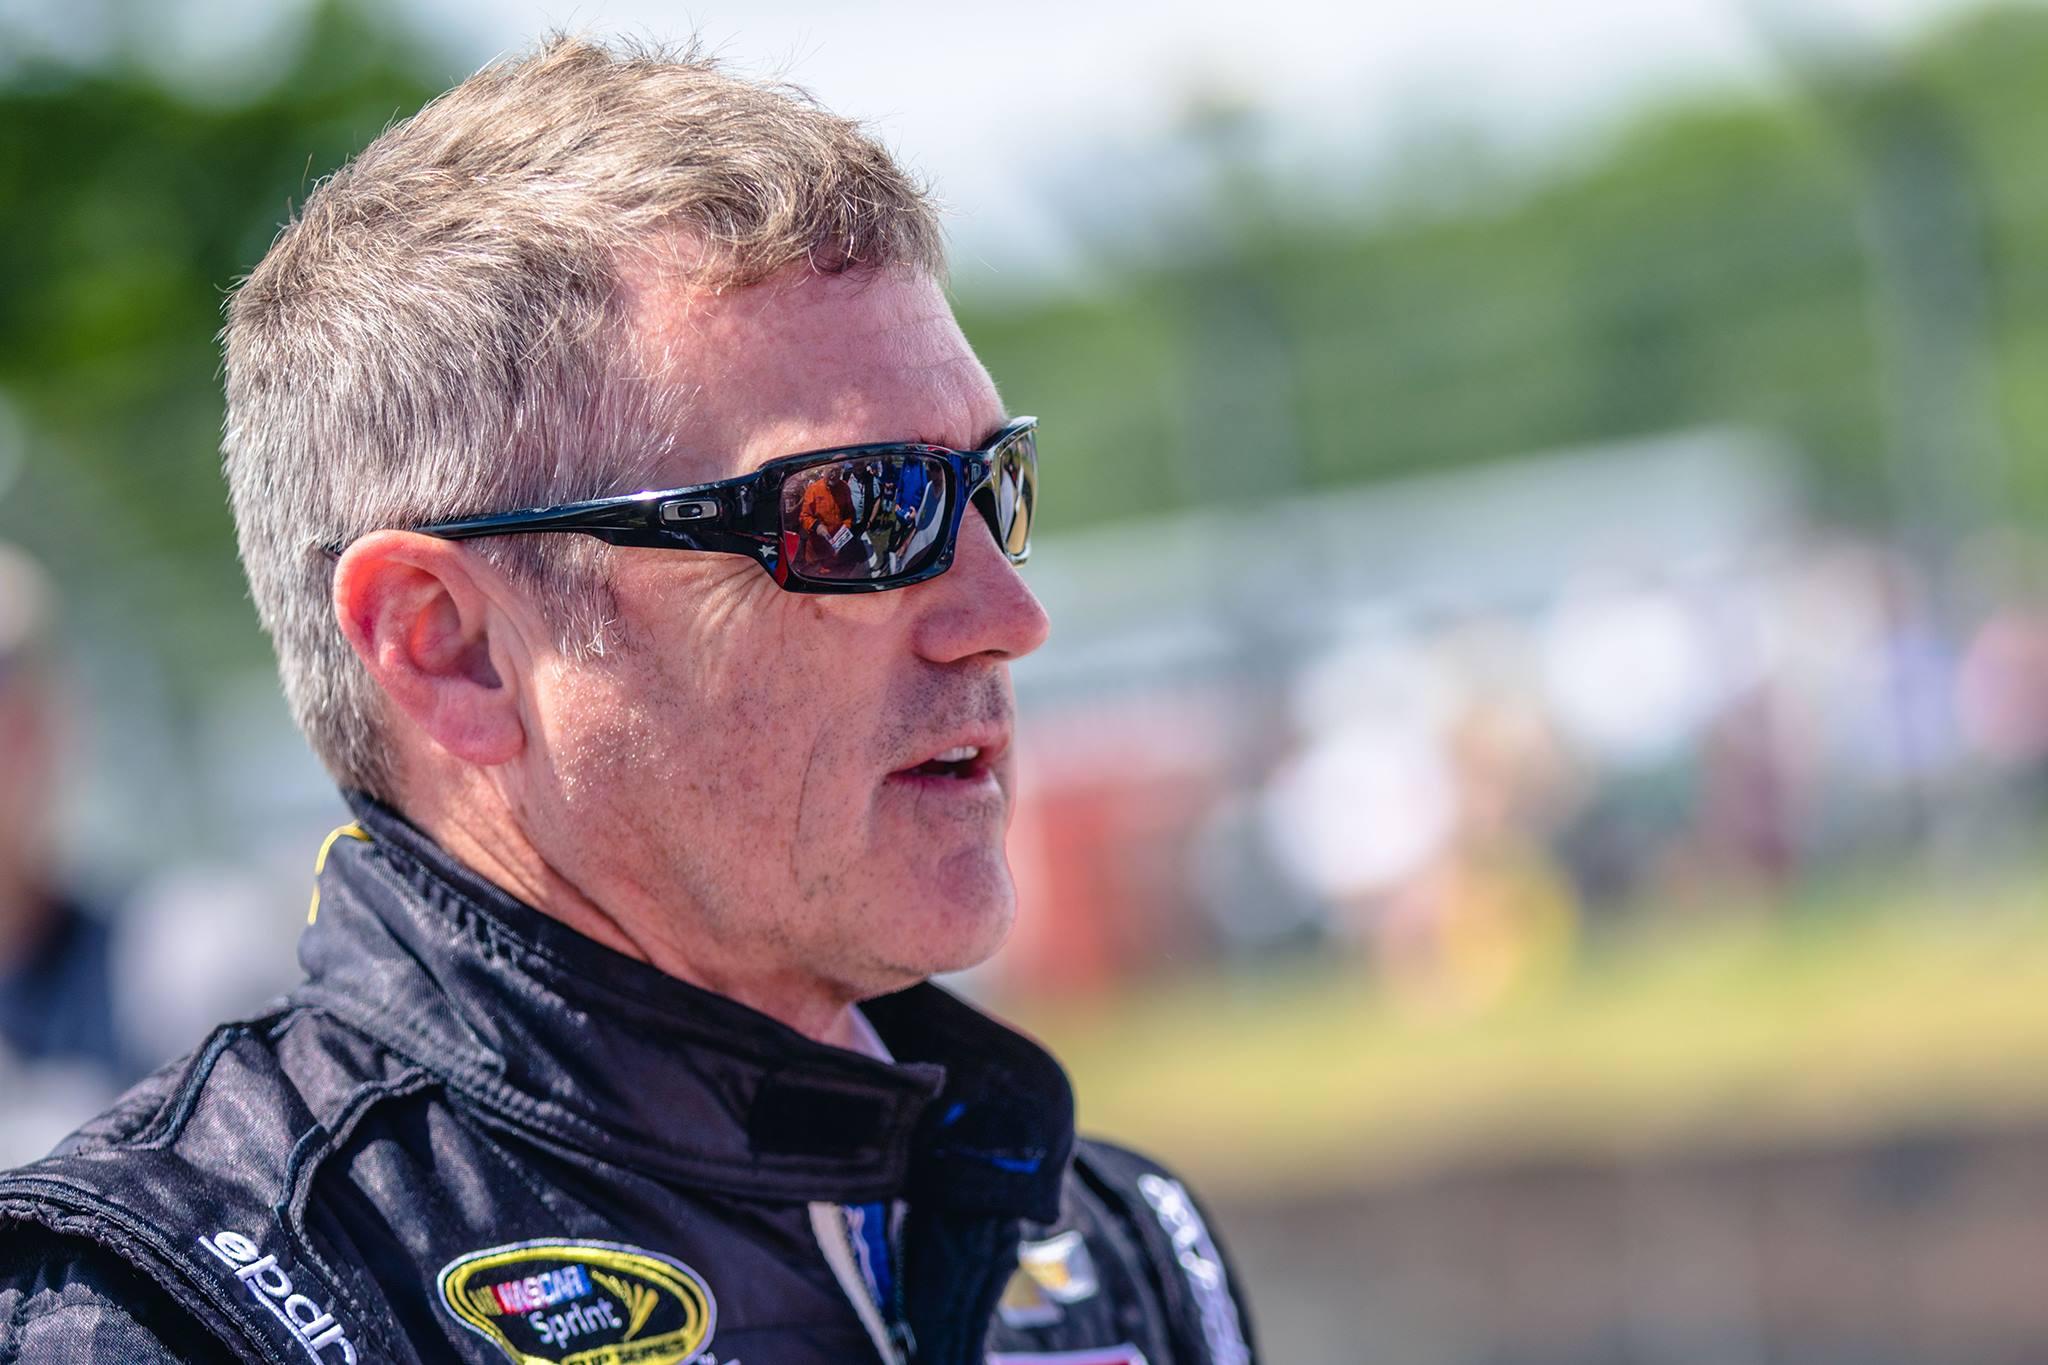 Bobby Labonte Returns To Racing With Euro Nascar Season Entry